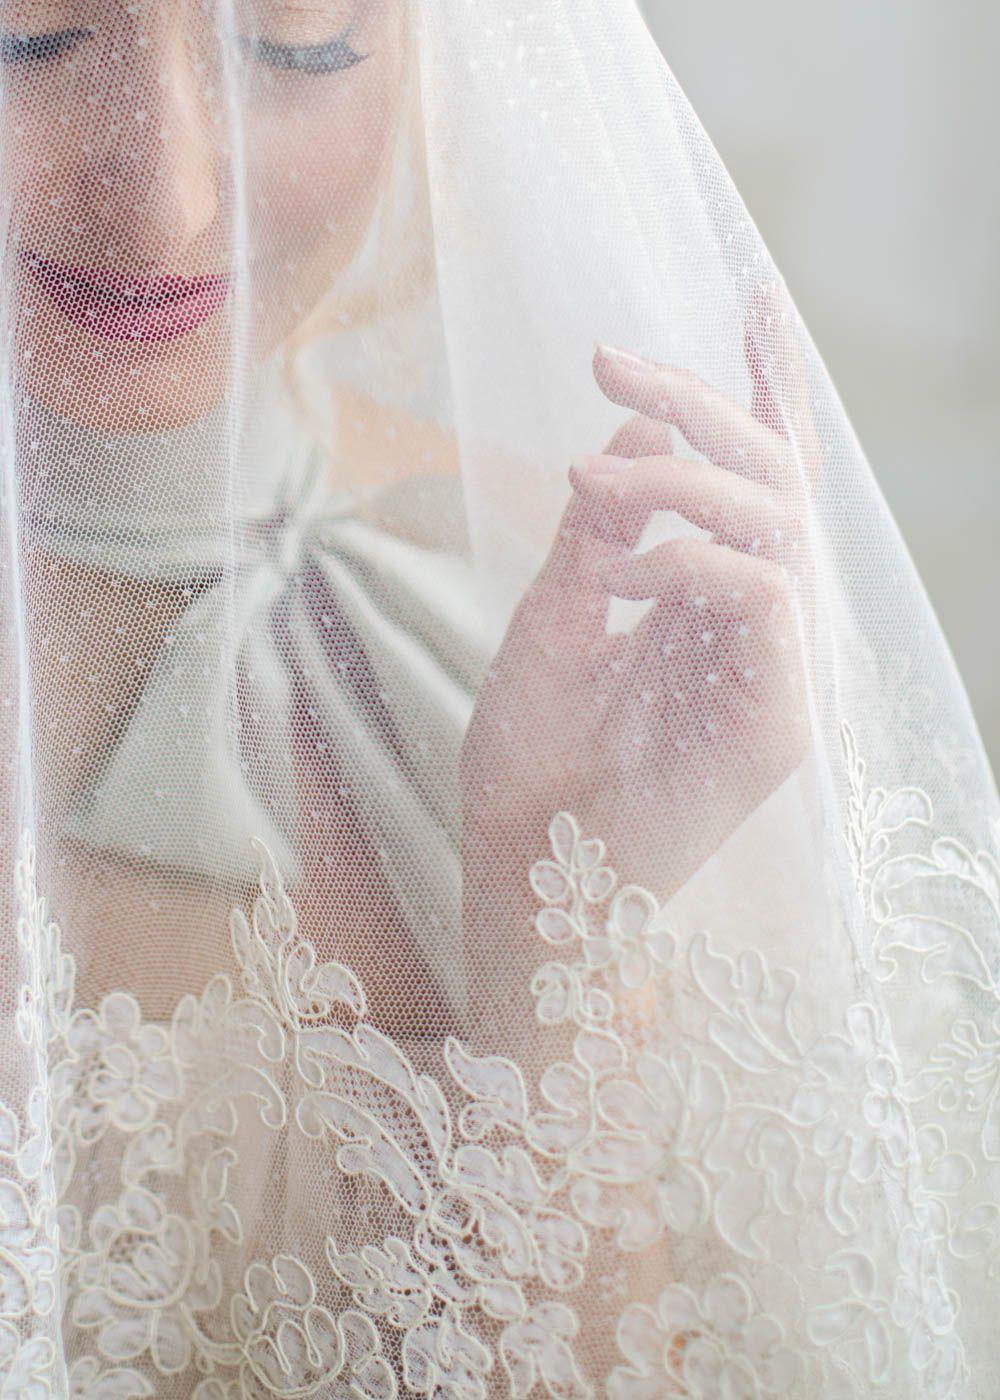 Bridal veil 写真 pinterest veil wedding and weddings